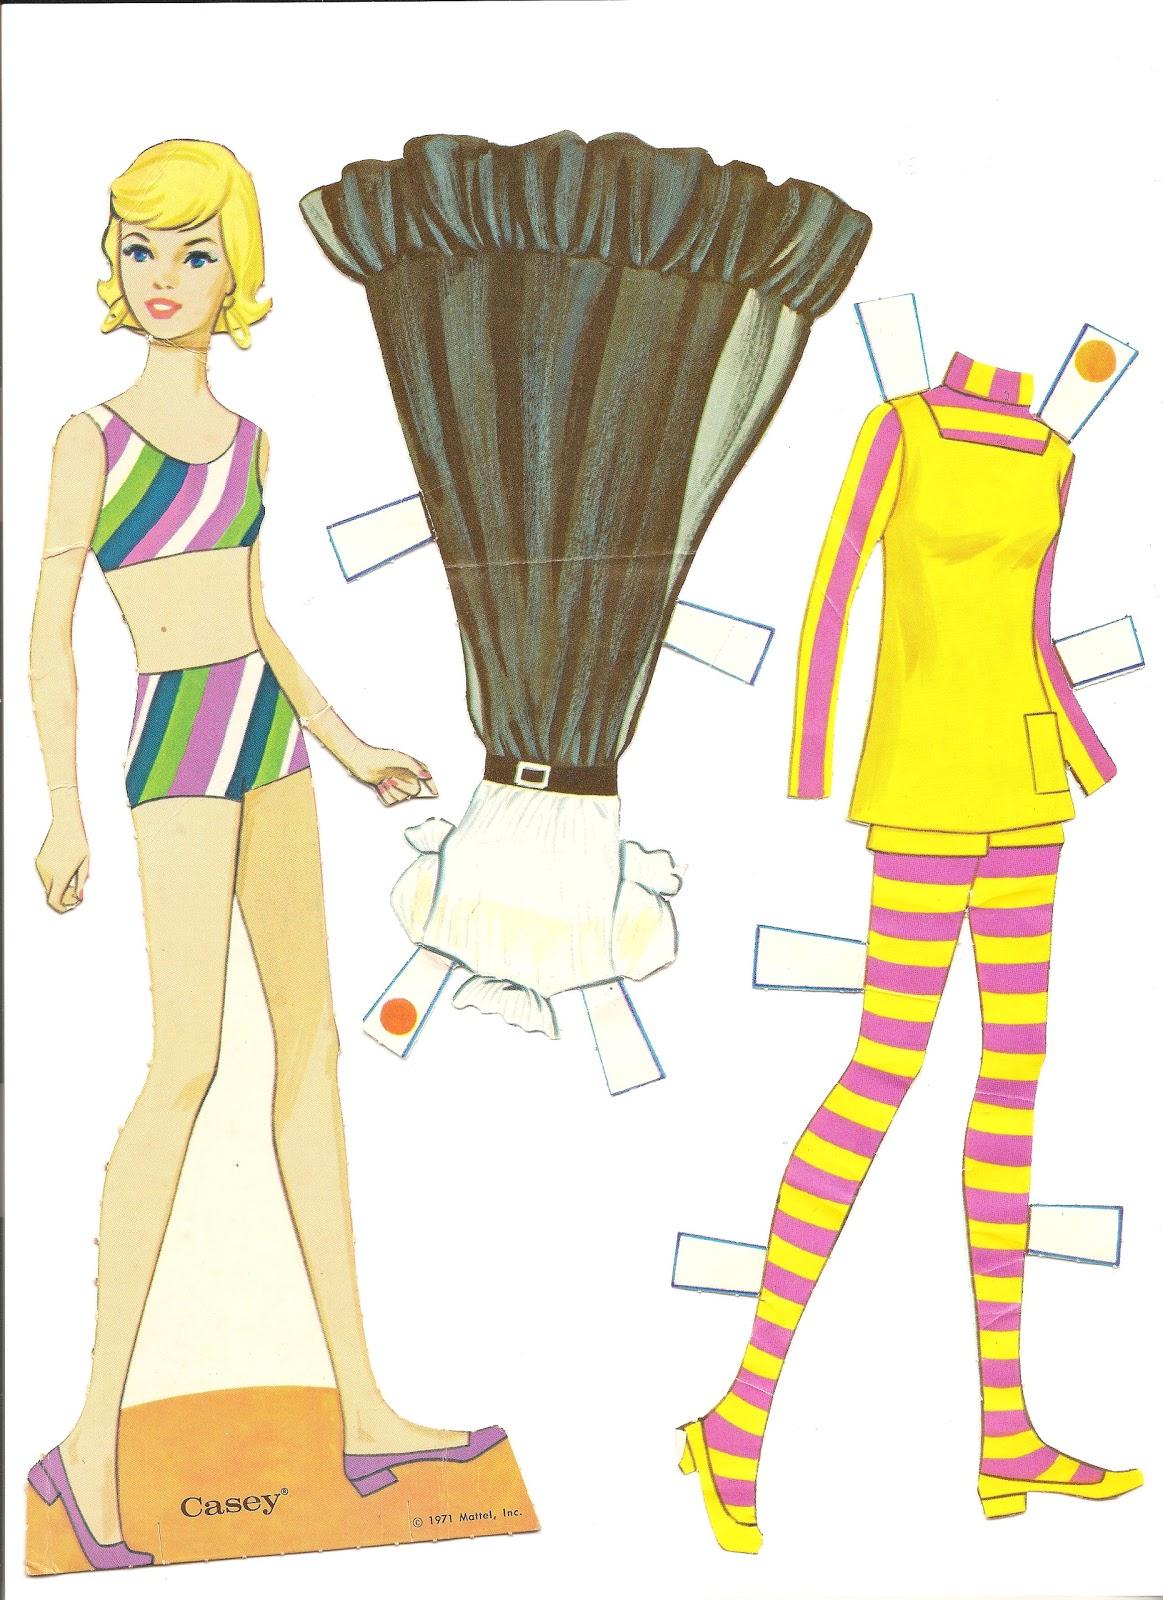 http://4.bp.blogspot.com/-cMhyRIdo3BE/T_zja8edqeI/AAAAAAAAD4c/eUoL47_osPw/s1600/barbie+5.jpg